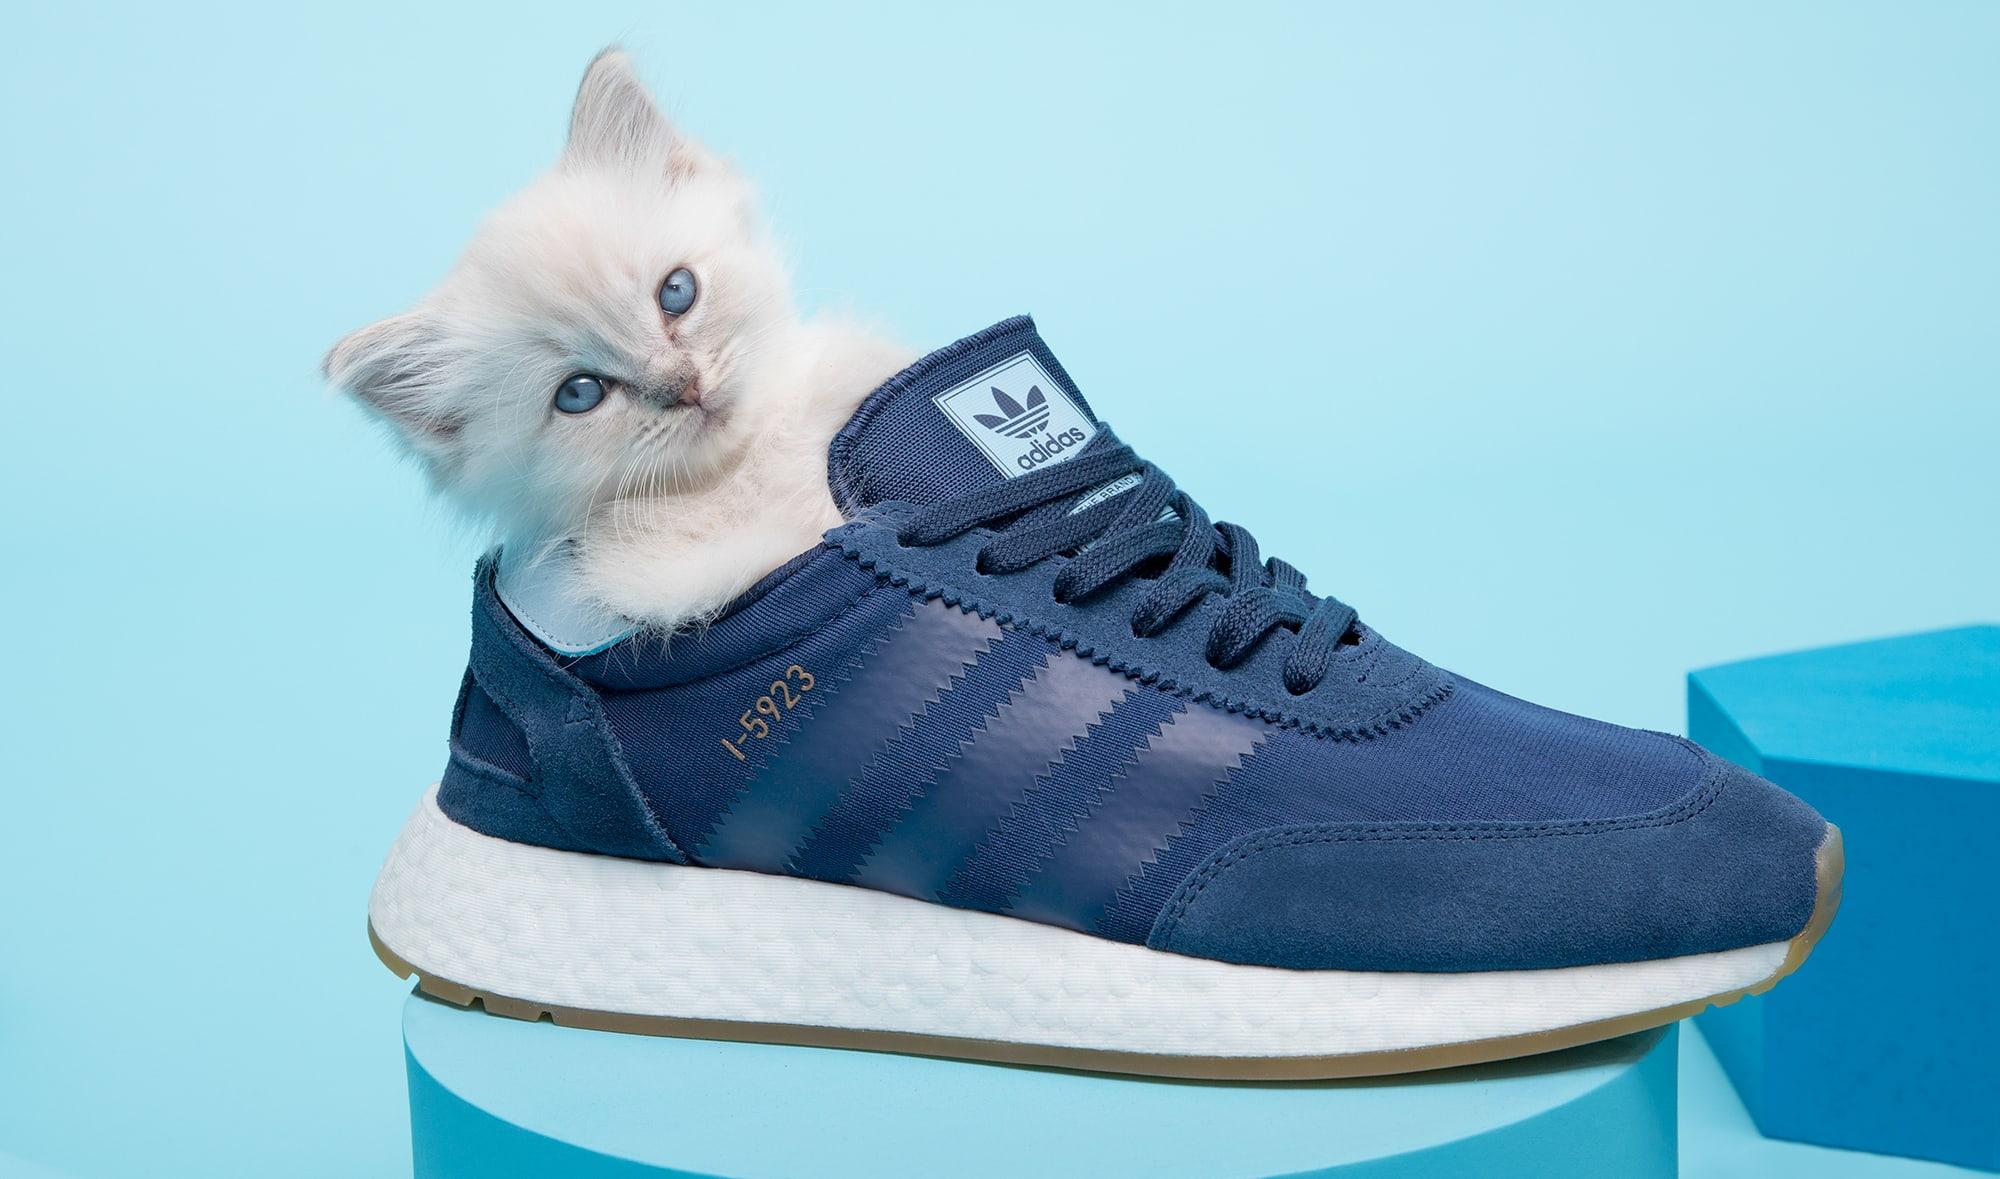 Sneakersnstuff Adidas I-5923 'Dark Blue' B43525